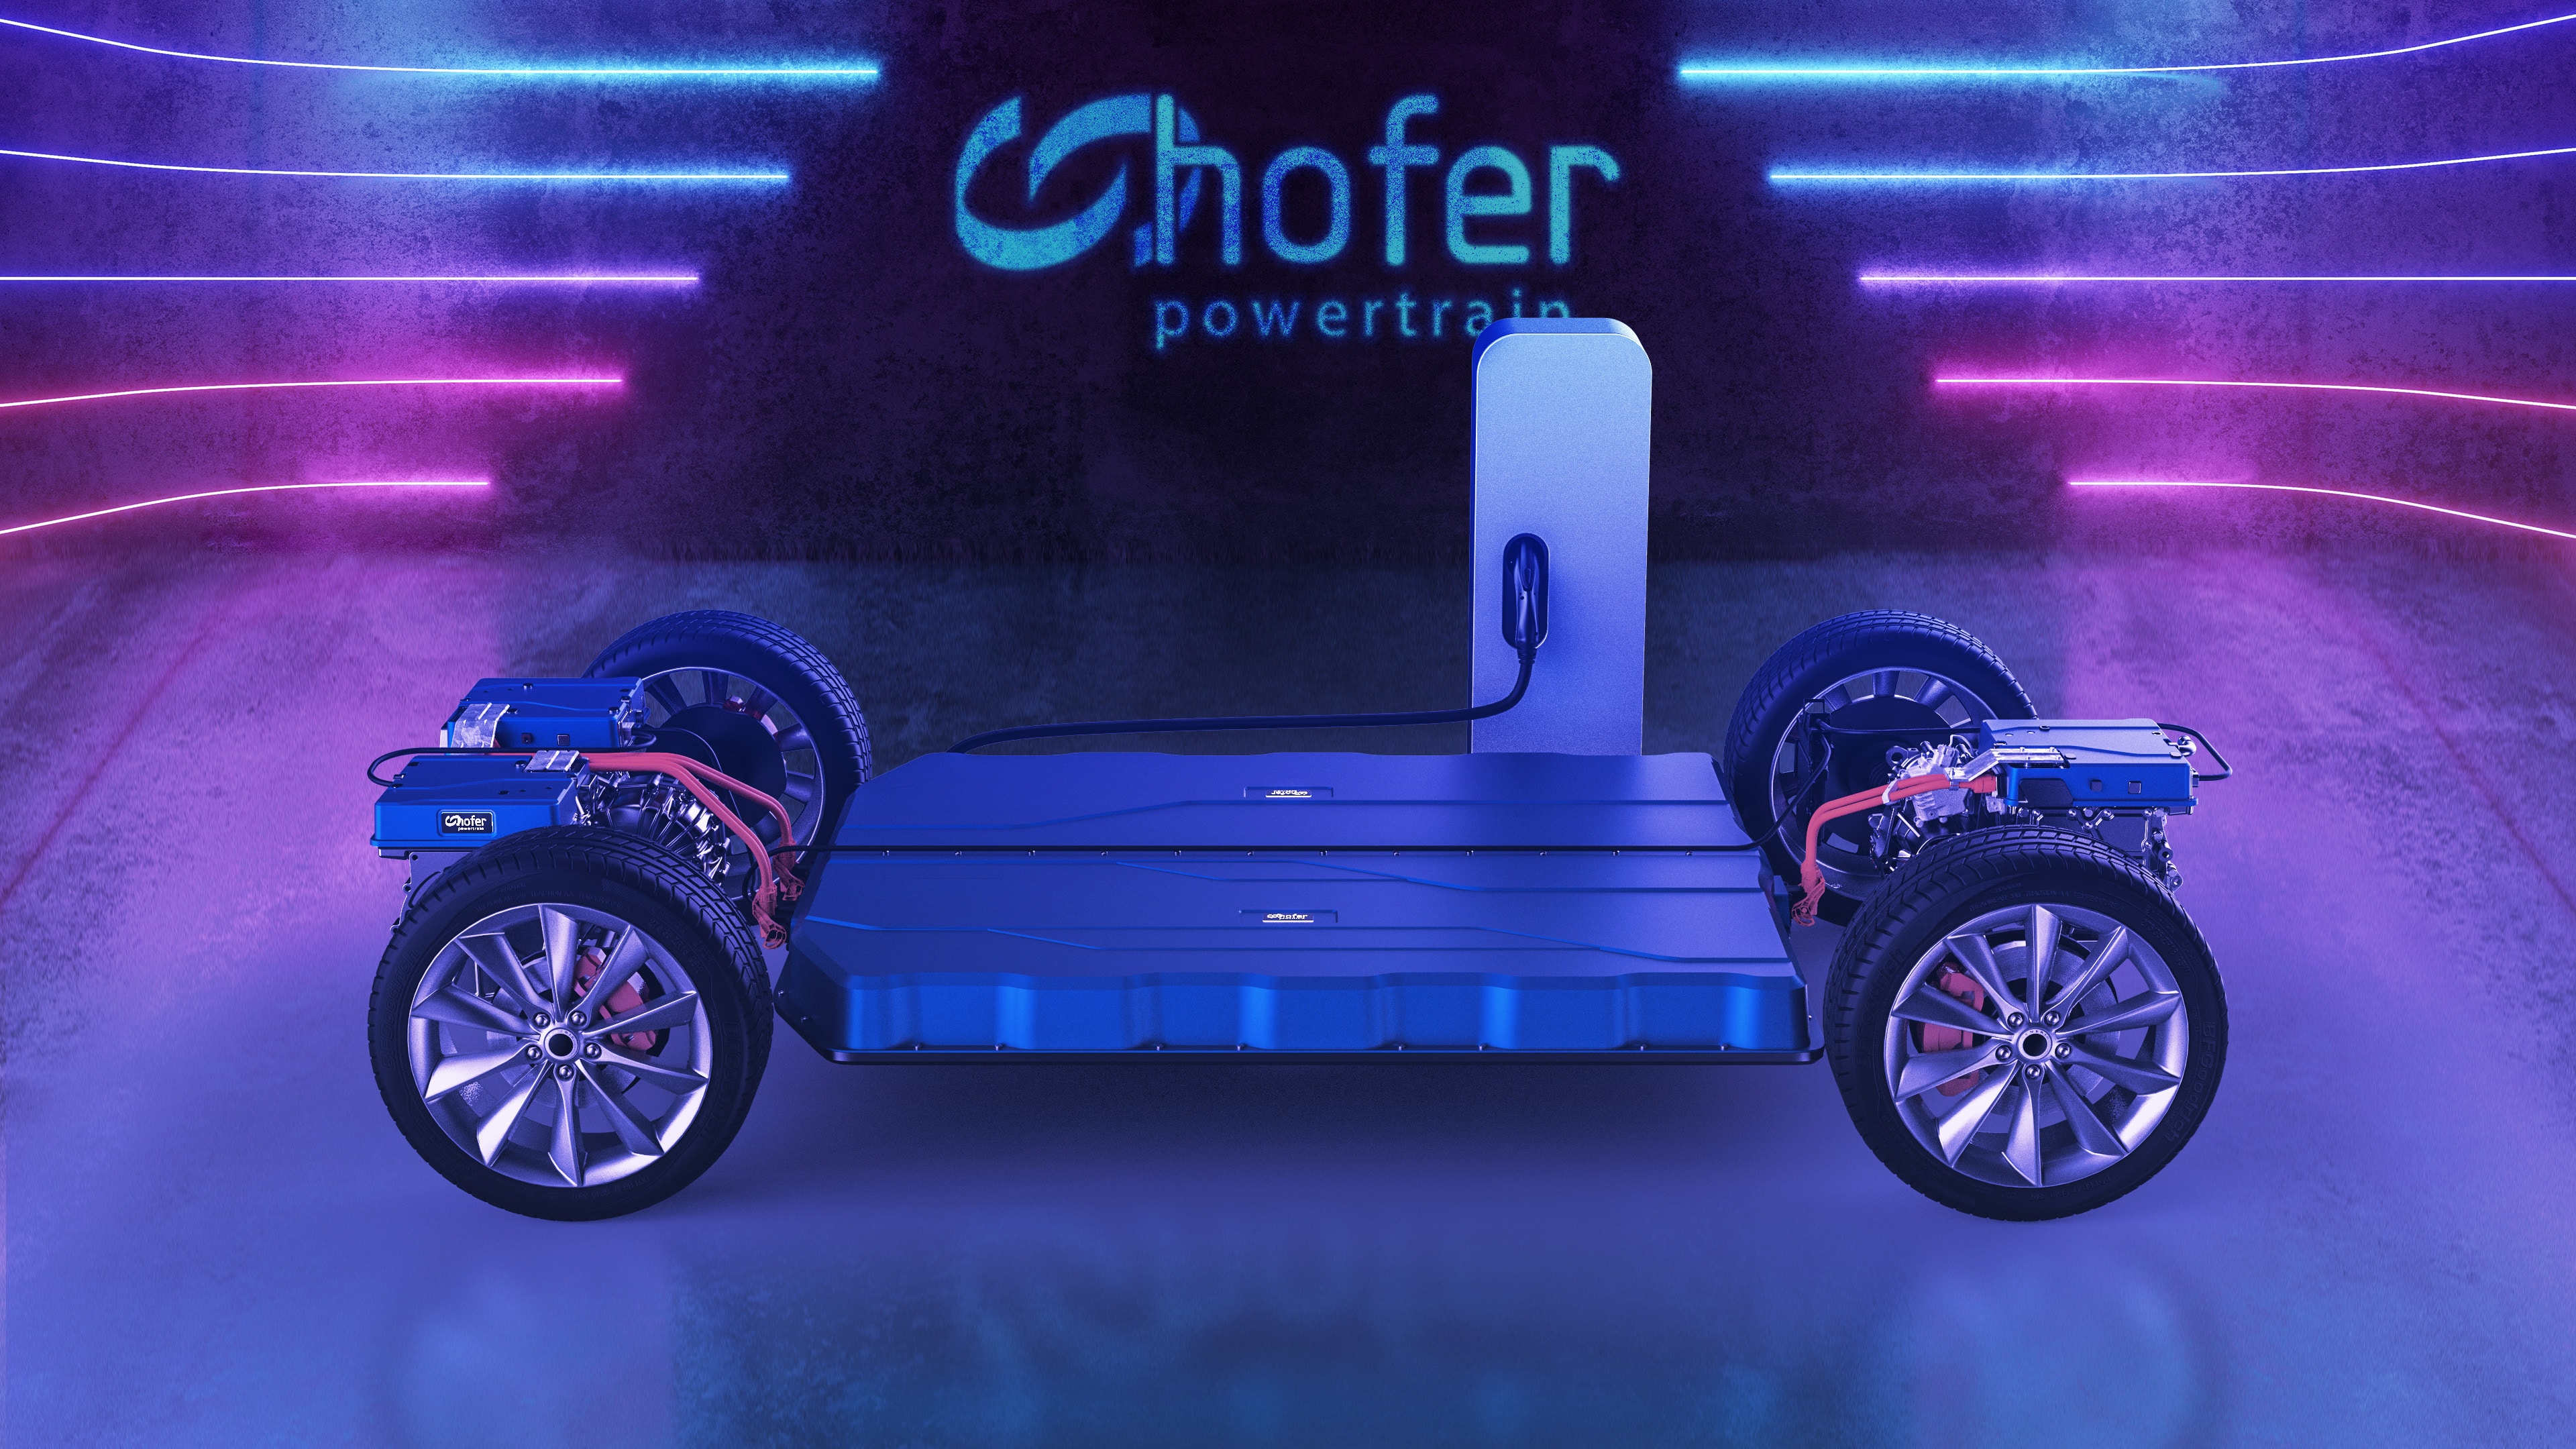 hofer powertrain boosts the electrification wave